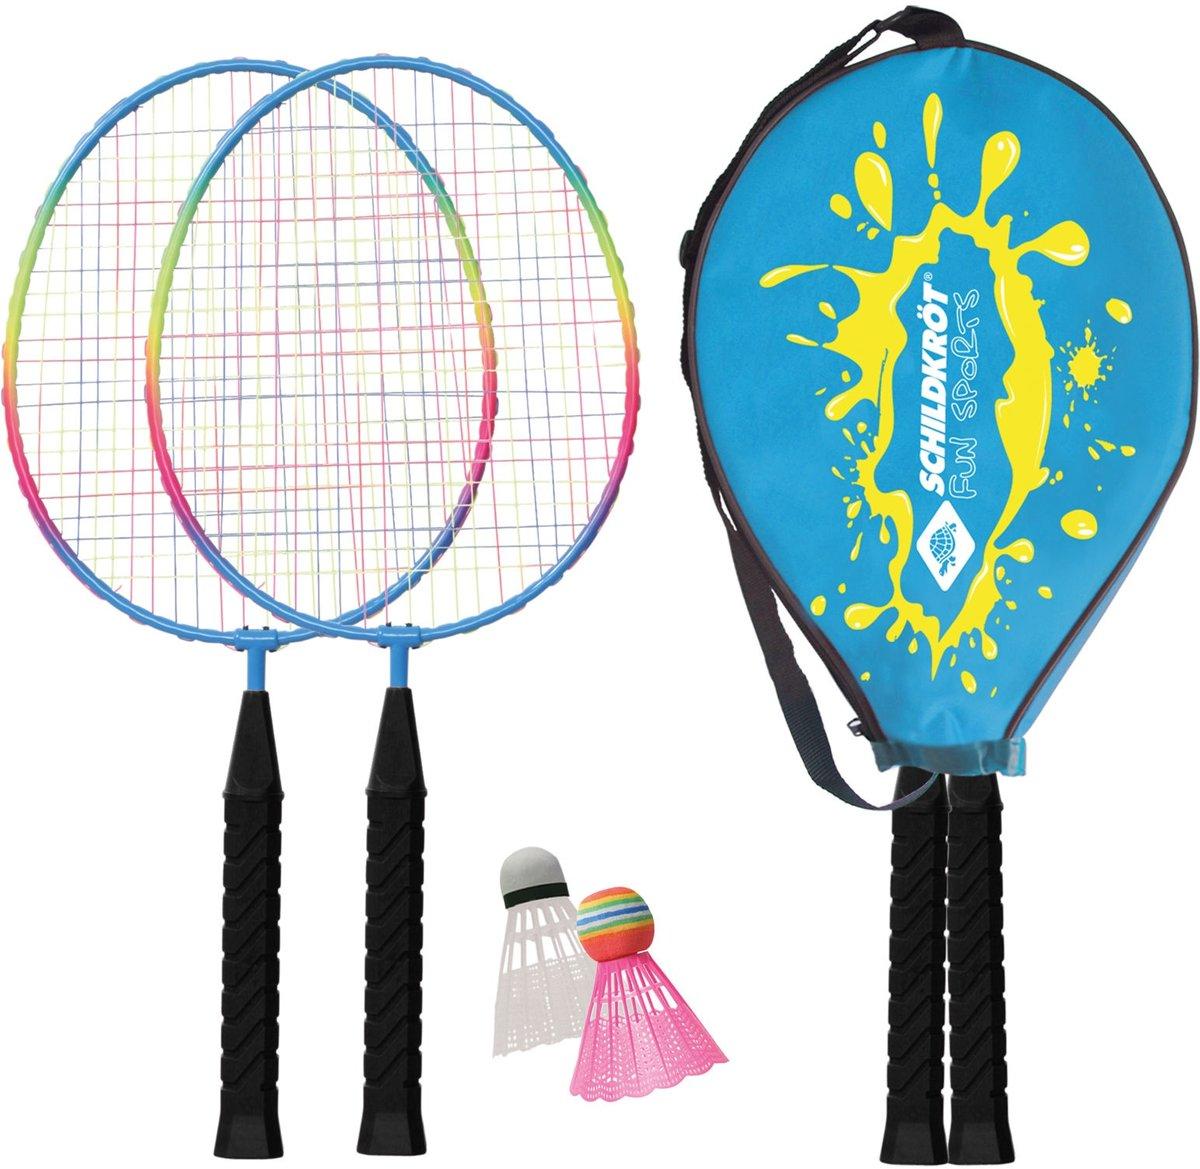 Donic Schildkr?t Badmintonset 4-delig Blauw